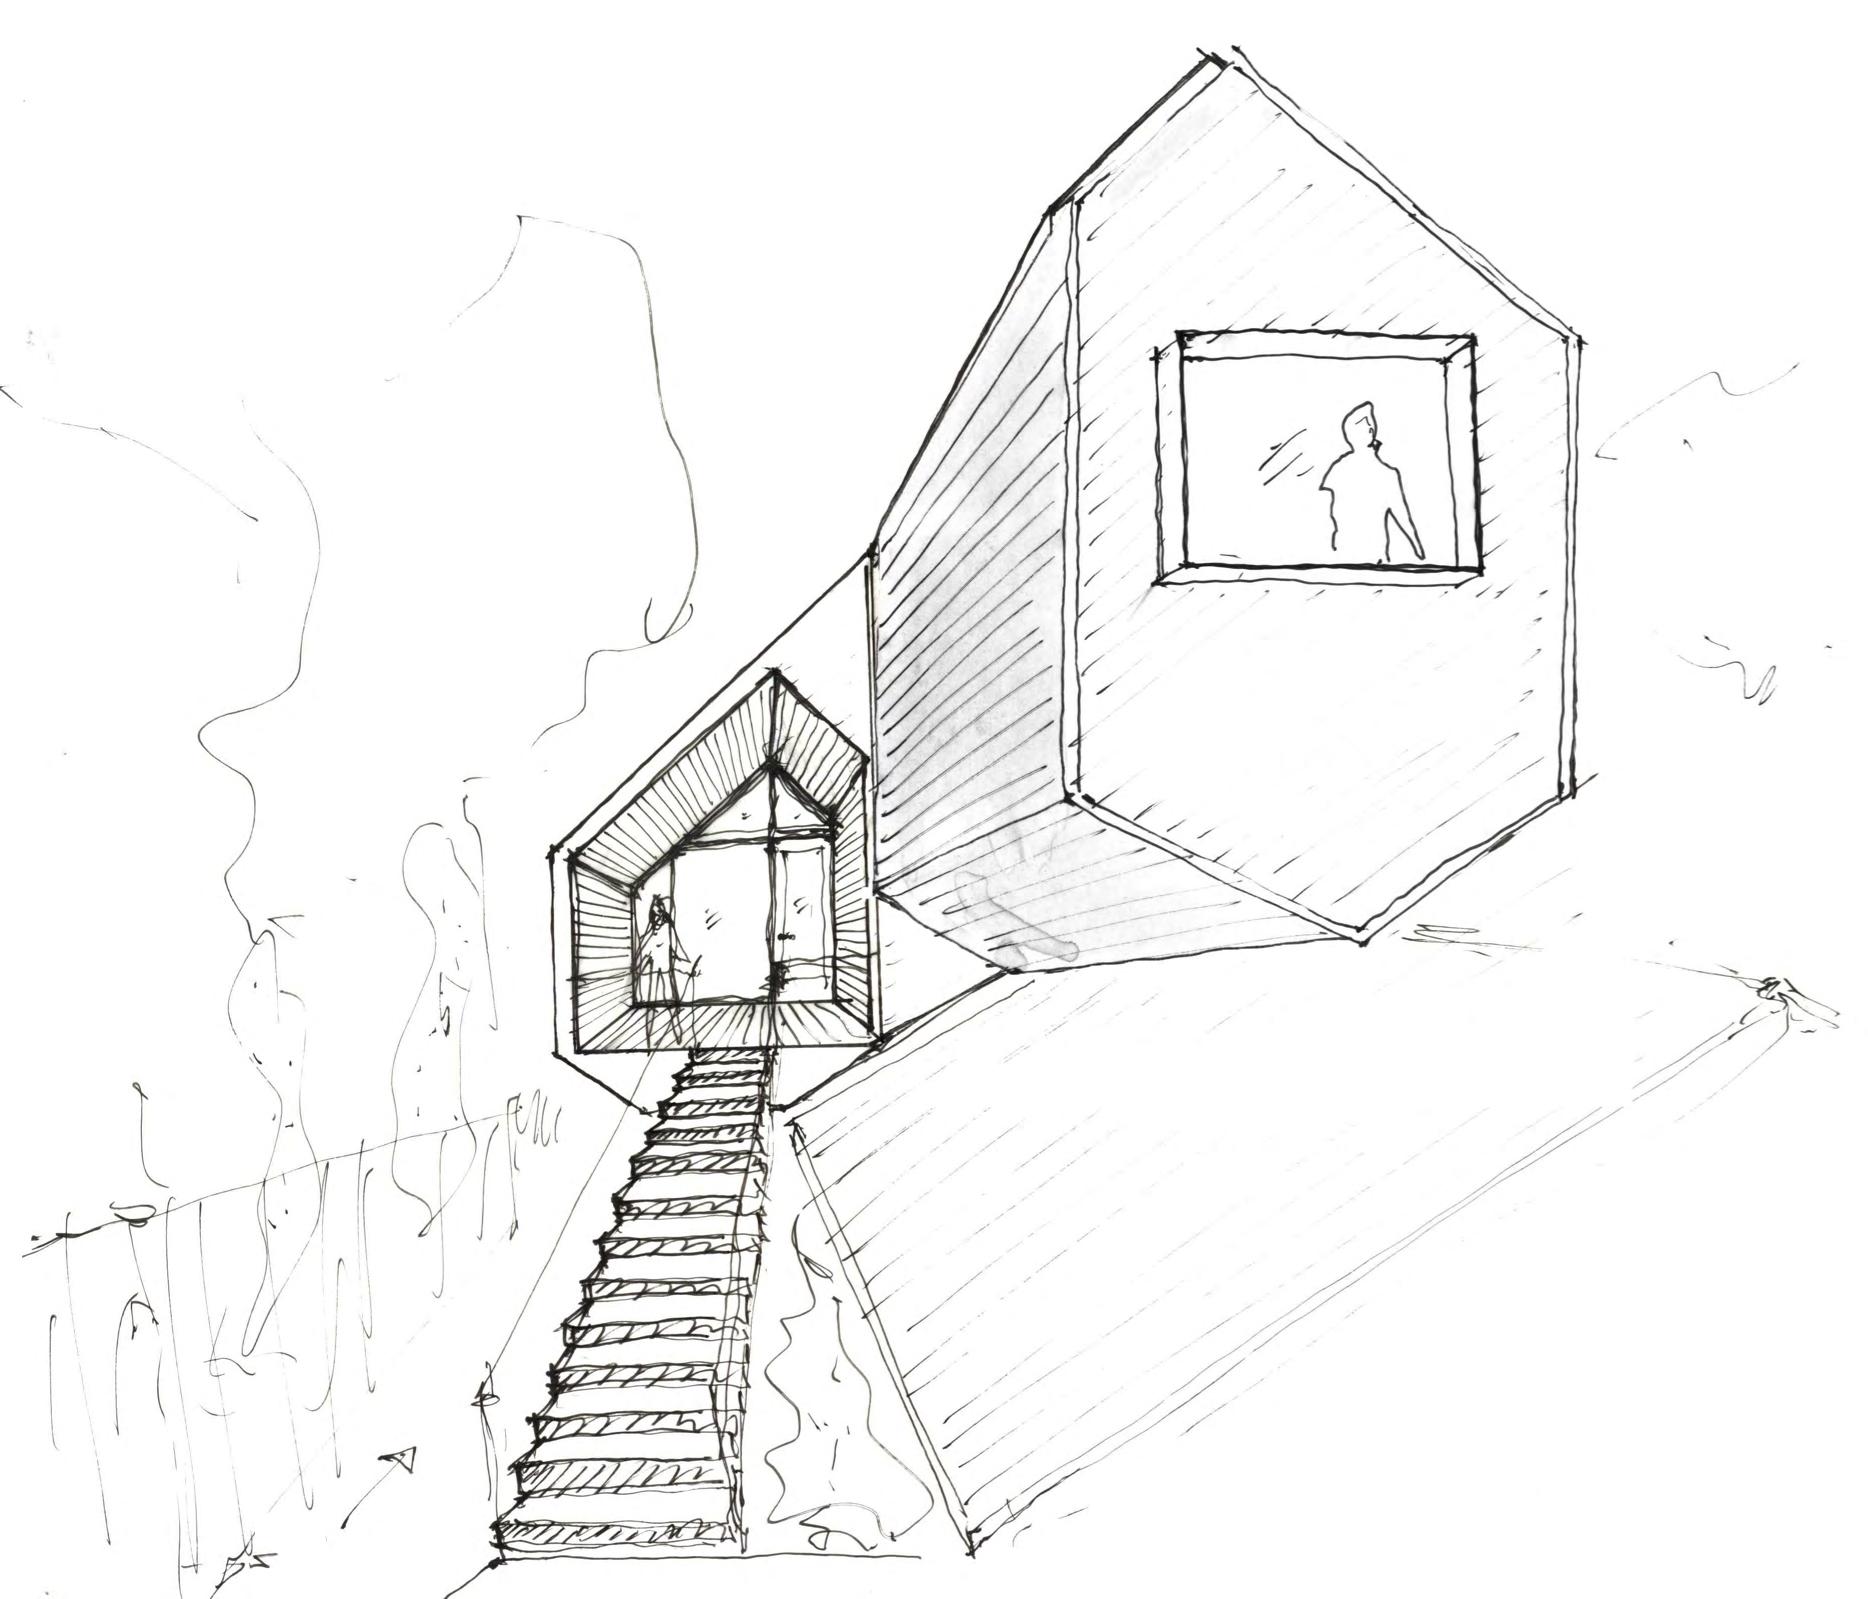 The Perch schematic design meeting sketch